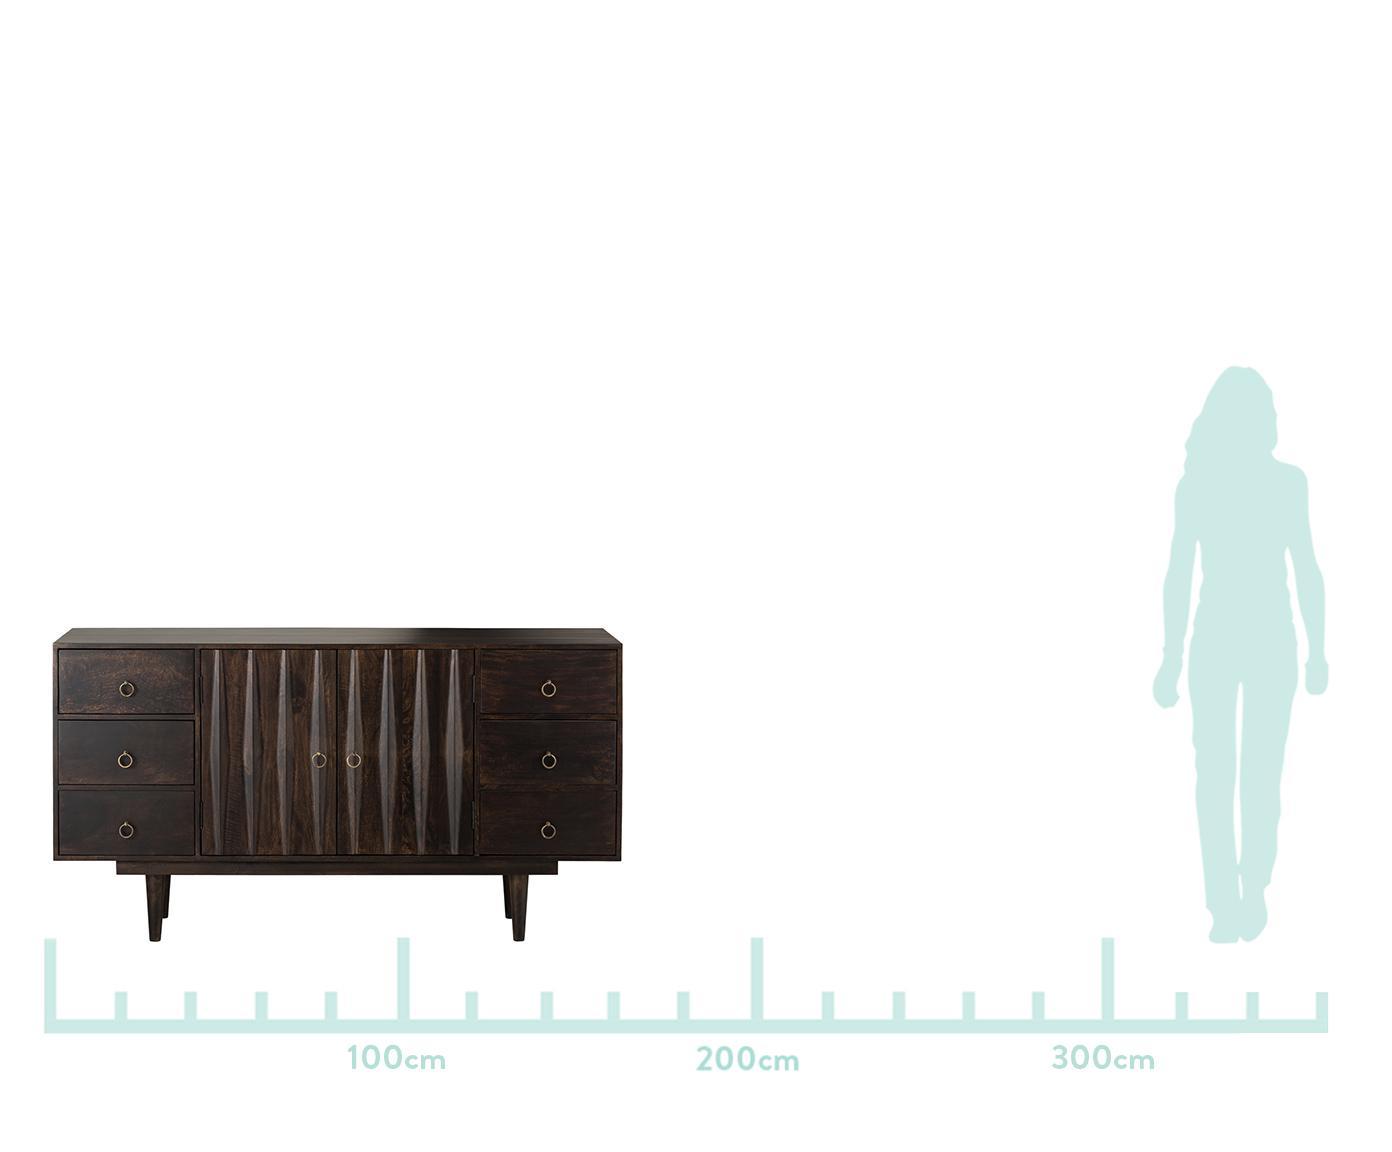 Sideboard Kent aus massivem Mangoholz, Korpus: Mangoholz, massiv, Griffe: Metall, Mangoholz, lackiert., Griffe: Metall, 160 x 86 cm